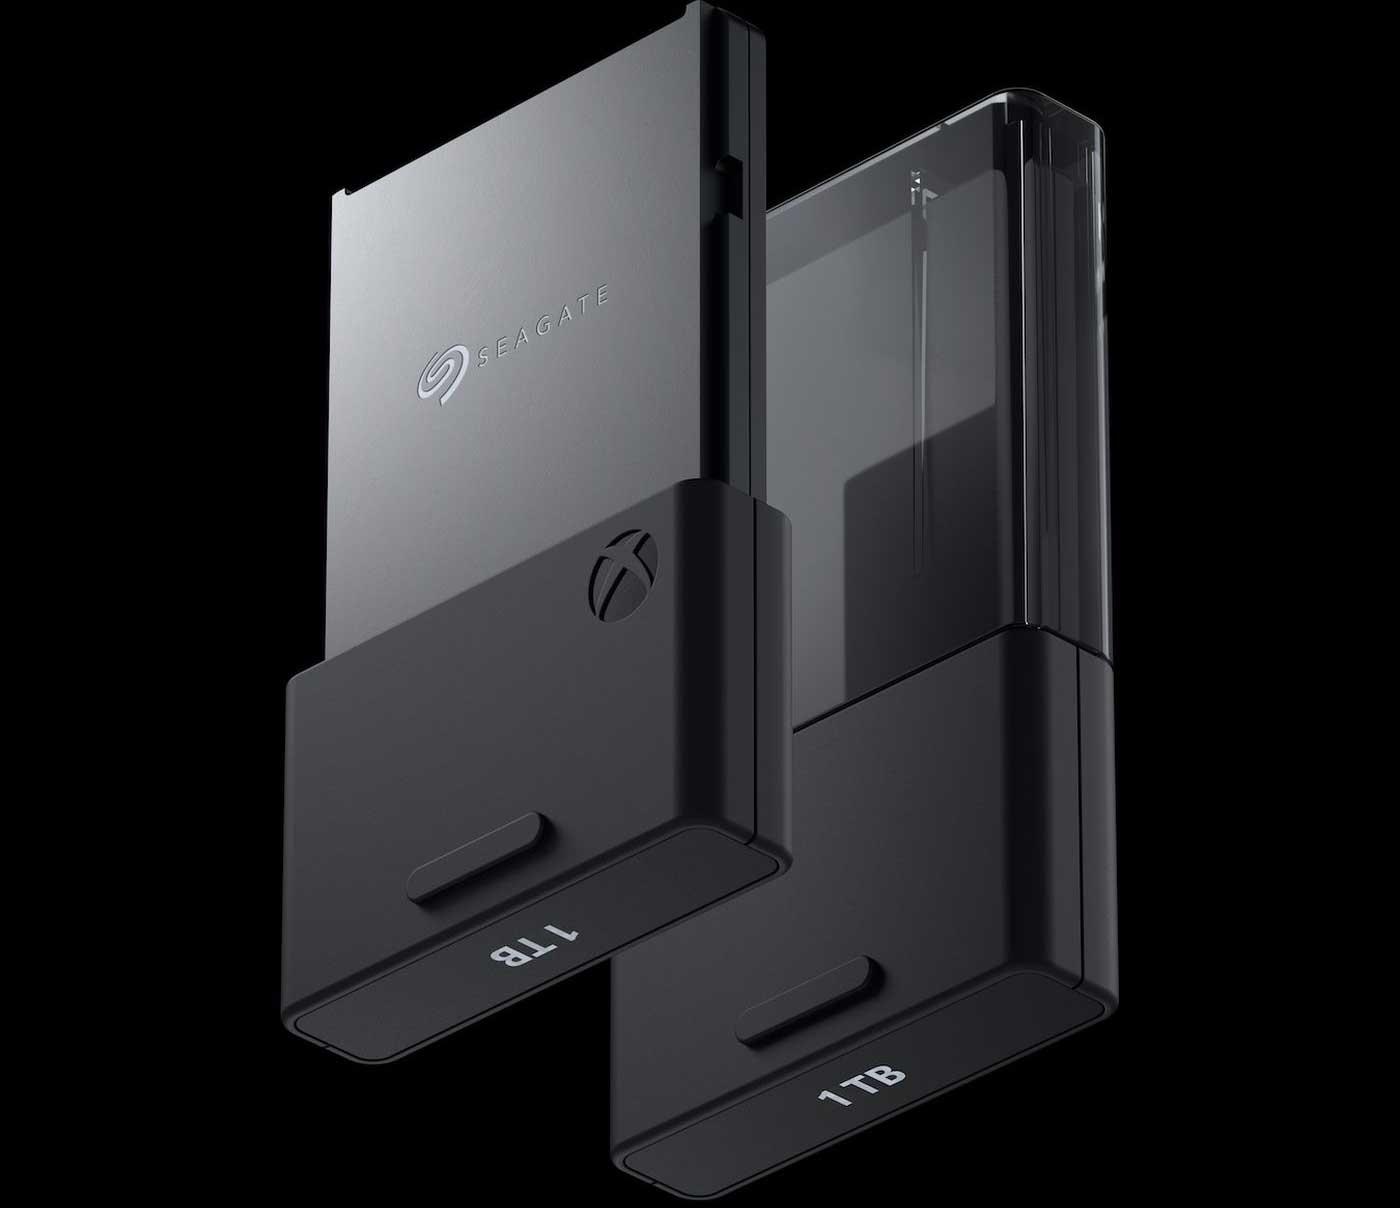 Xbox Series X 1TB Game Drive Storage Expansion